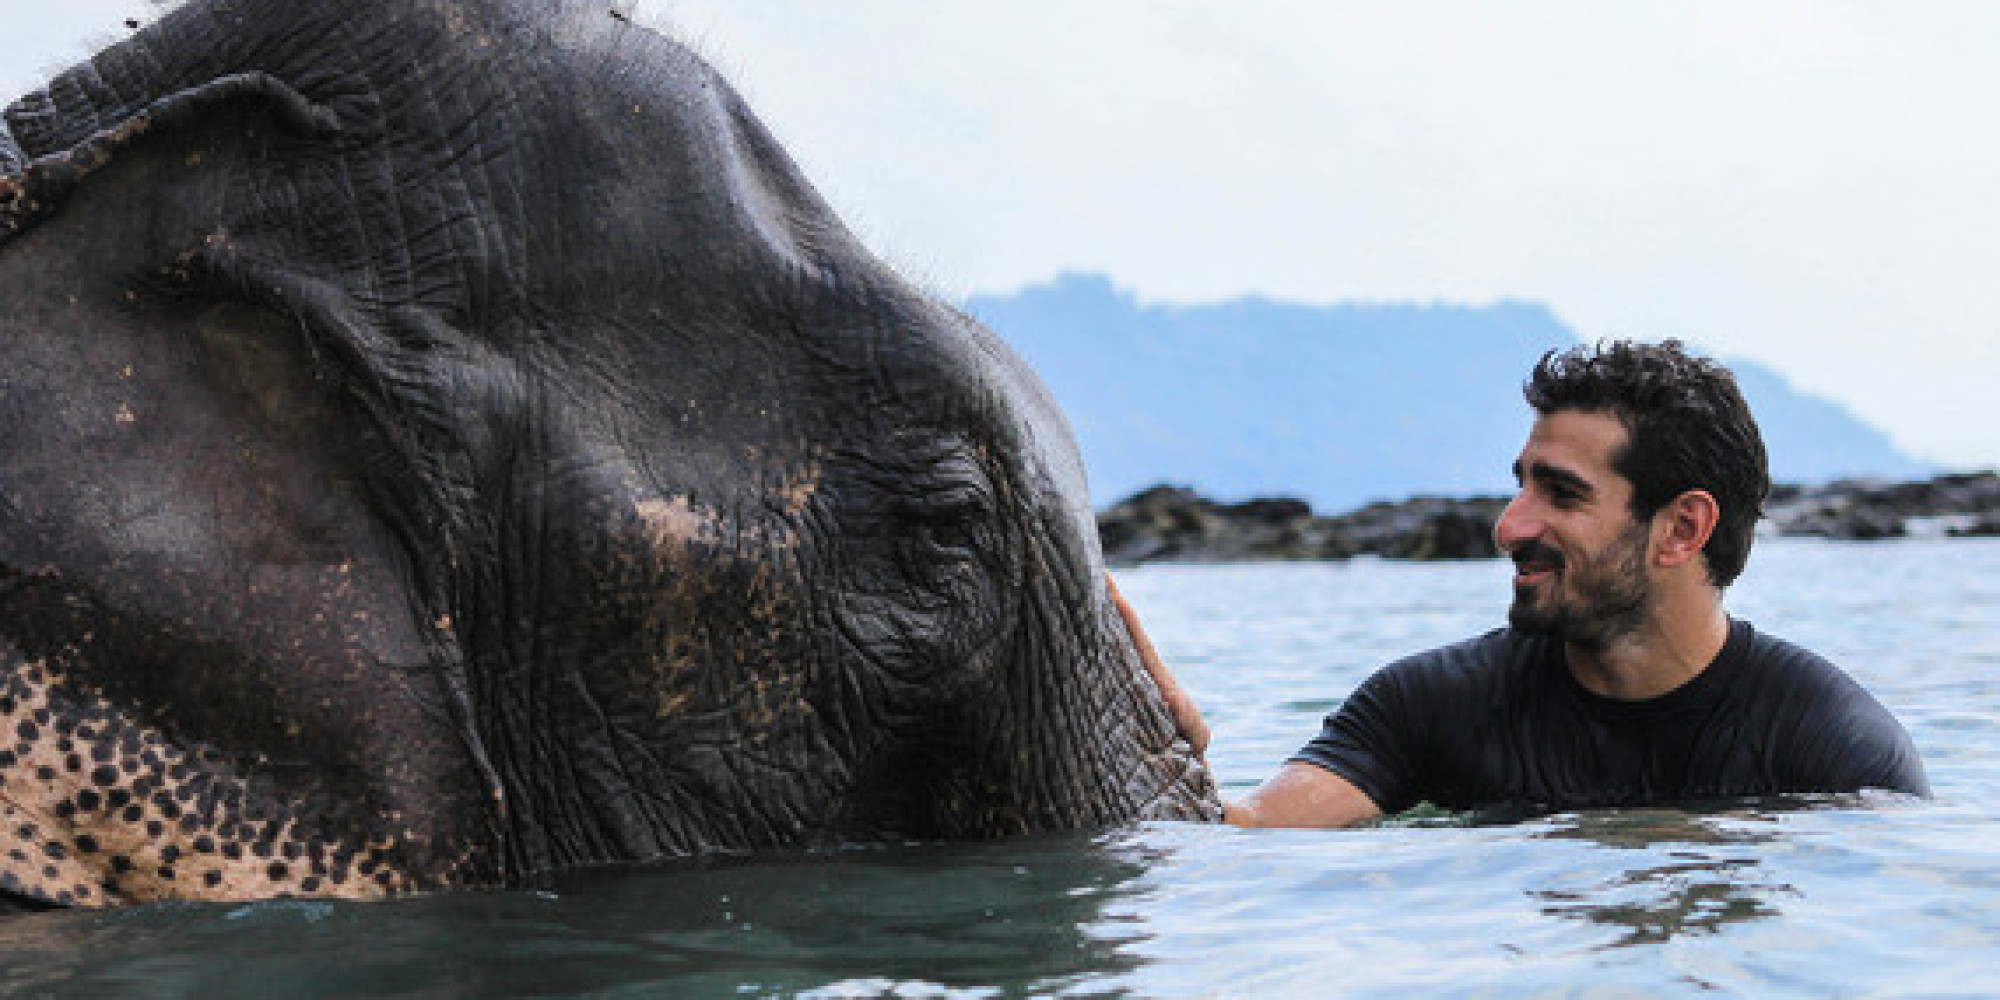 World Wildlife Day: Why We Need Wild Animals|Paul Rosolie